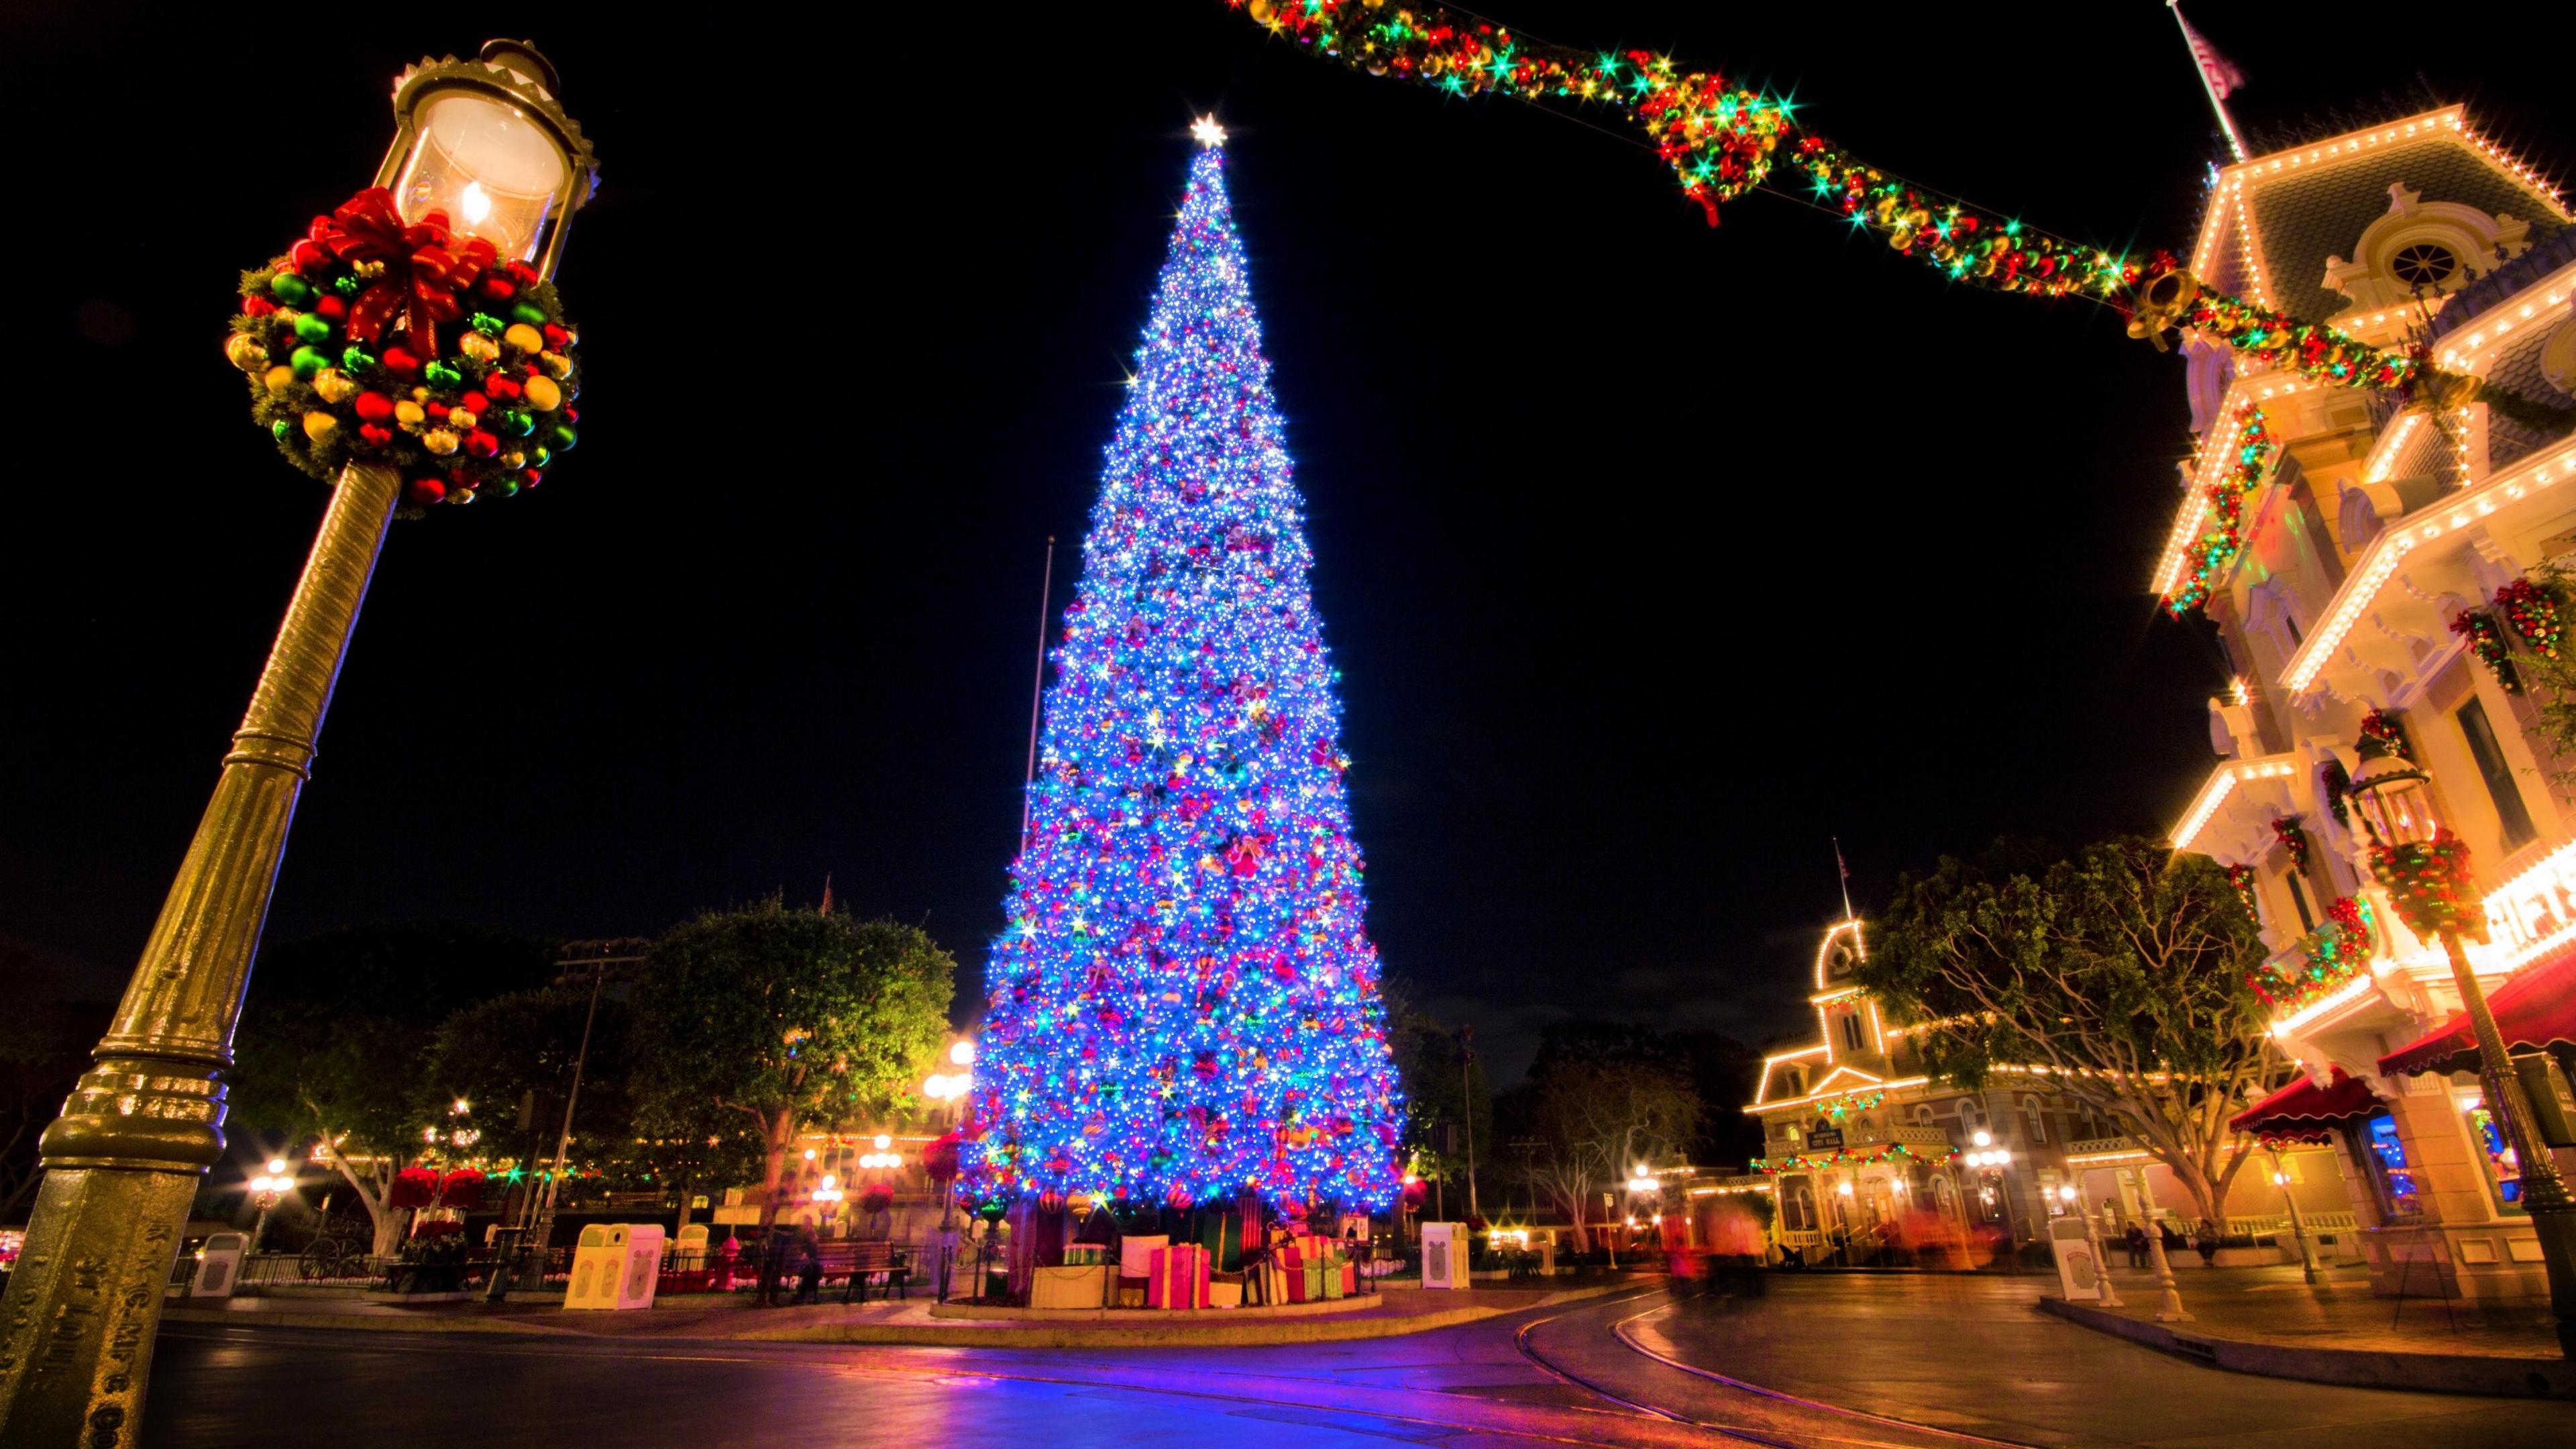 new_year_christmas_tree_city_ornaments_garlands_balloons_holiday_mood_gifts_35725_3840x2160.jpg